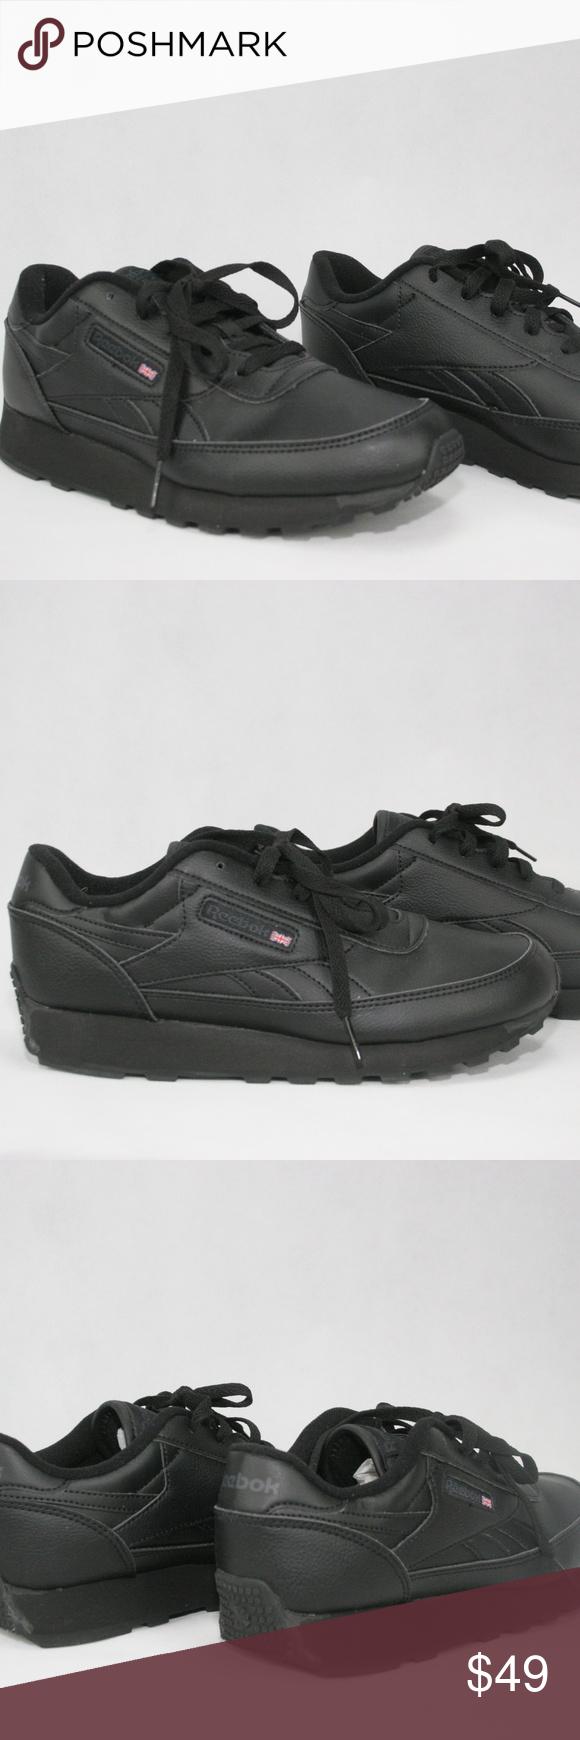 c1153a0fc69 Womens Shoes Reebok Size 8.5 Reebok Classic Renaissance Black Femmes These womens  Reebok Renaissance shoes enhance